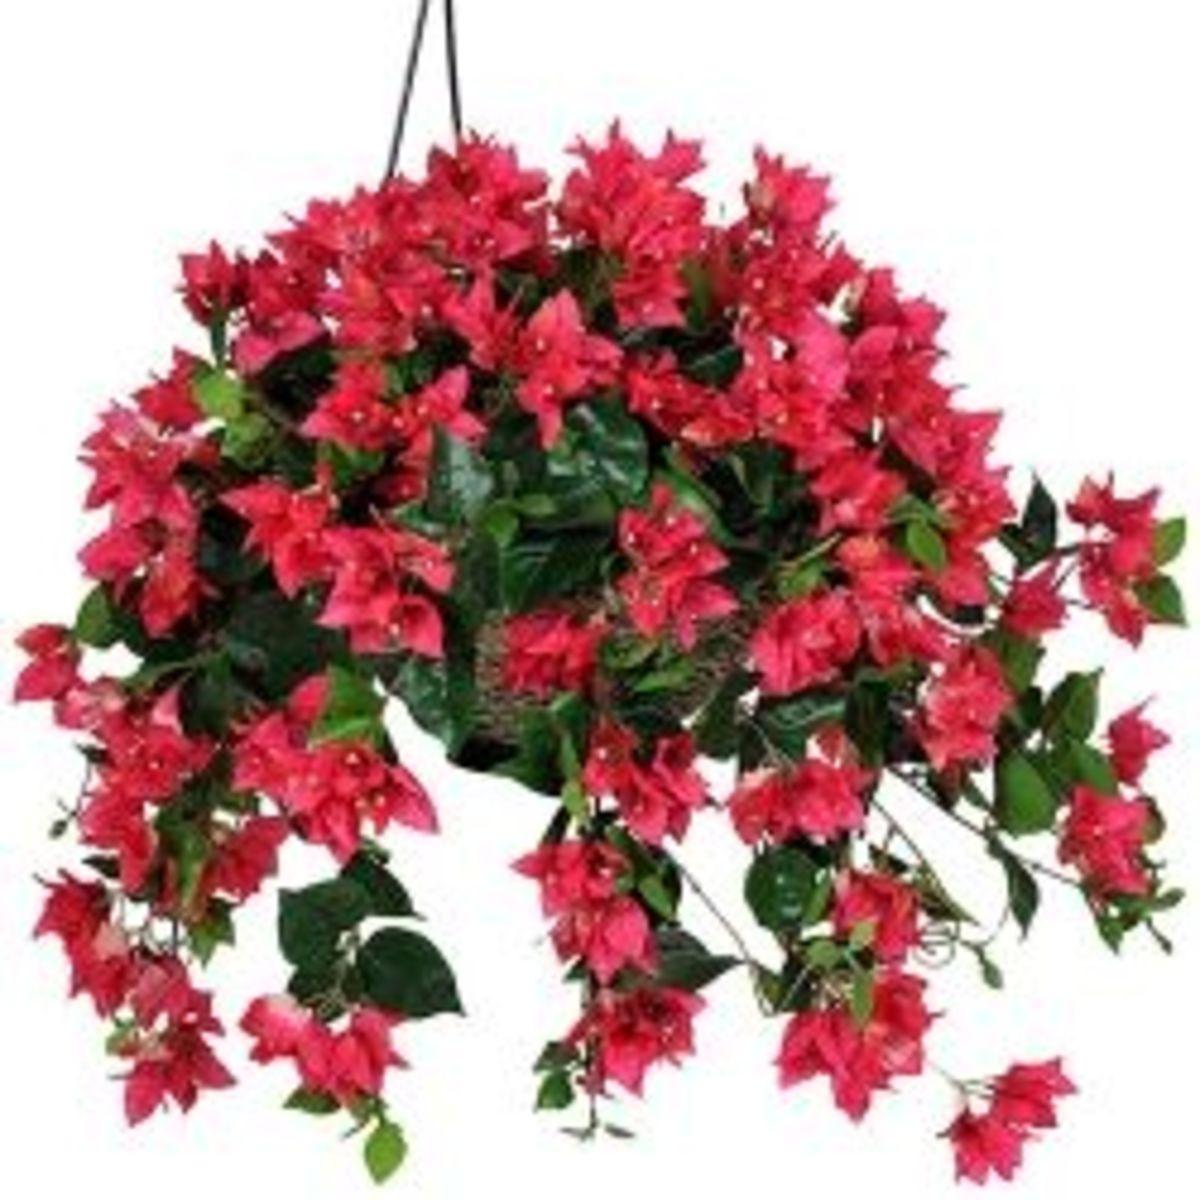 Artificial Hanging Flower Bushes, Baskets & Potted Plants | Summer Decor Ideas